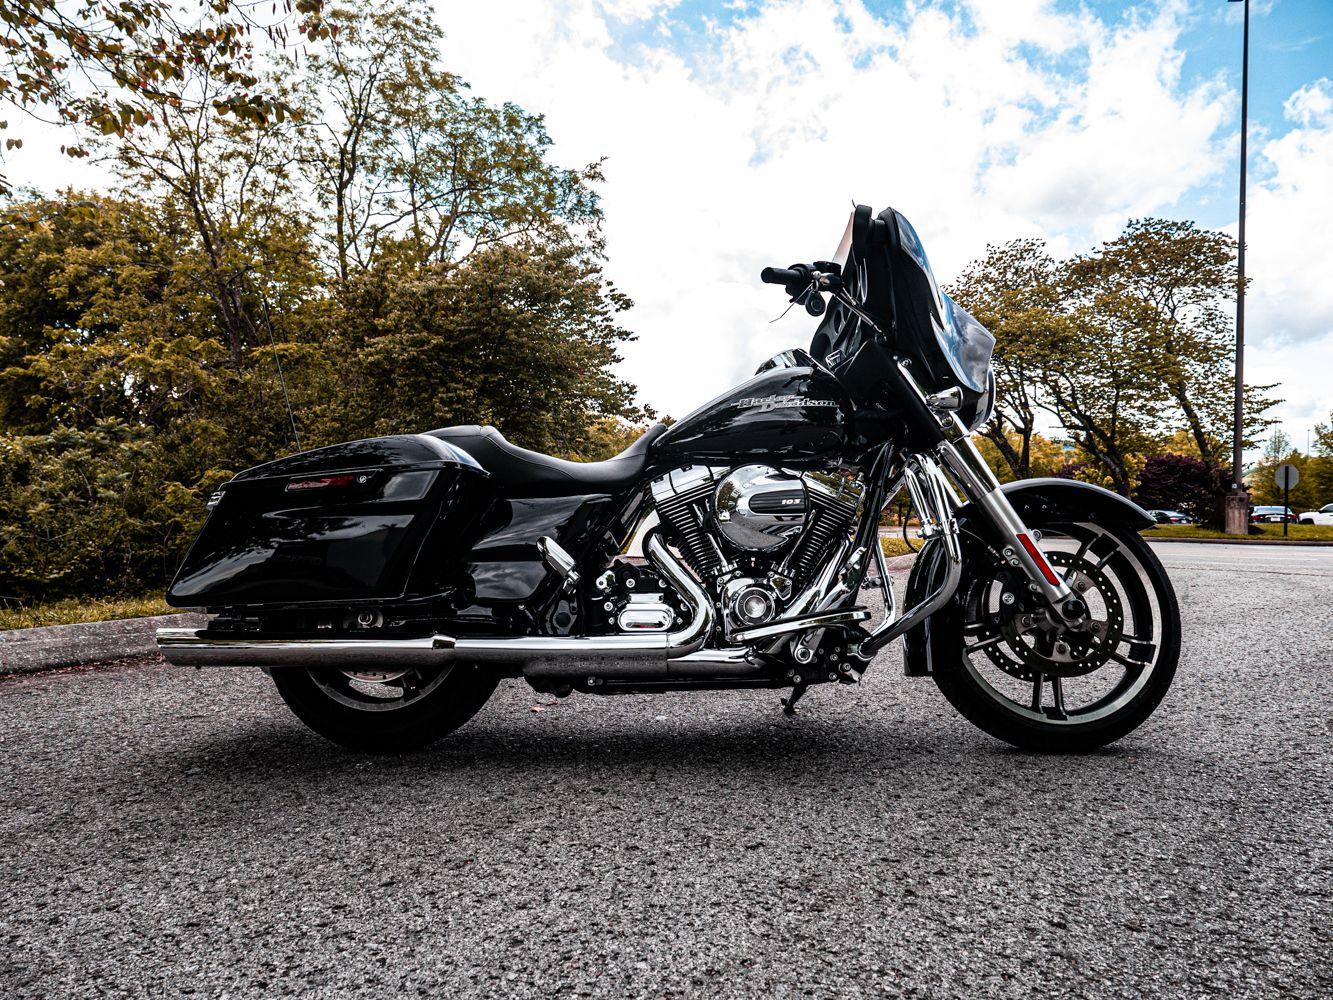 Pre-Owned 2015 Harley-Davidson Street Glide